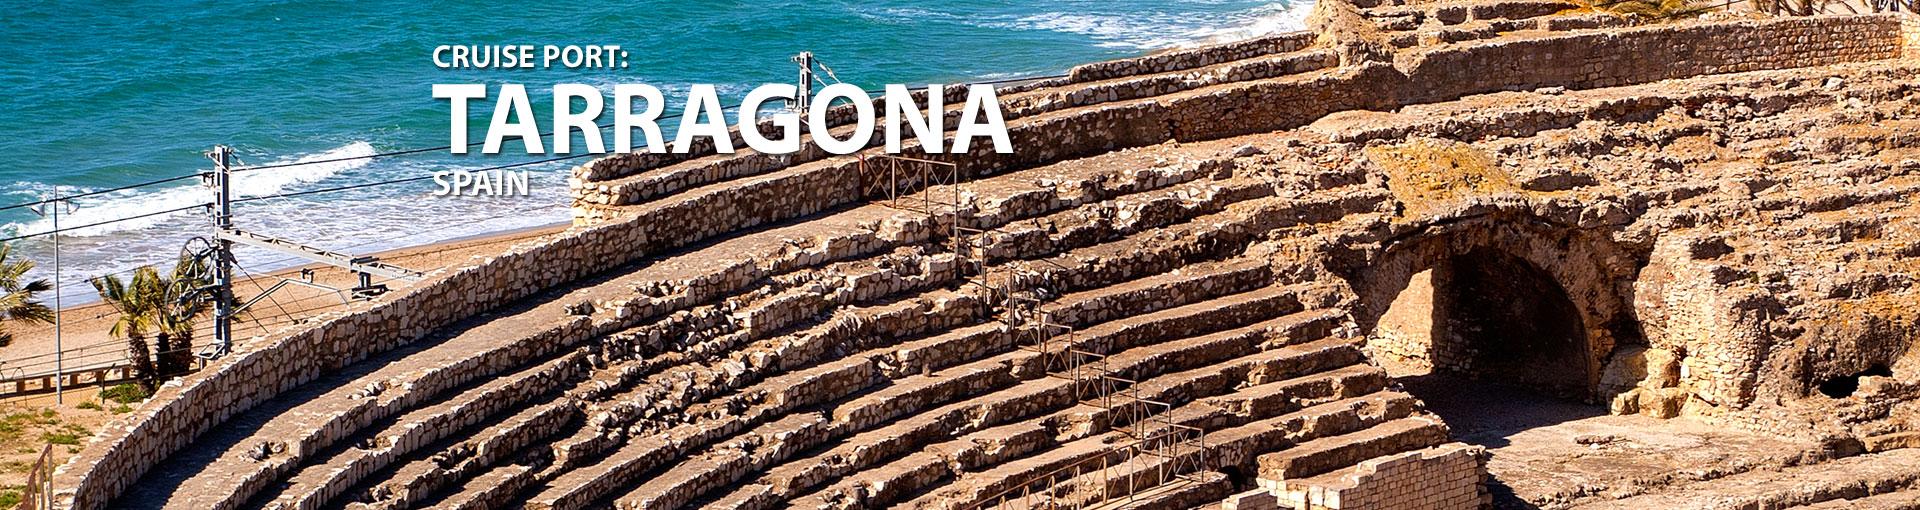 Cruises to Tarragona, Spain